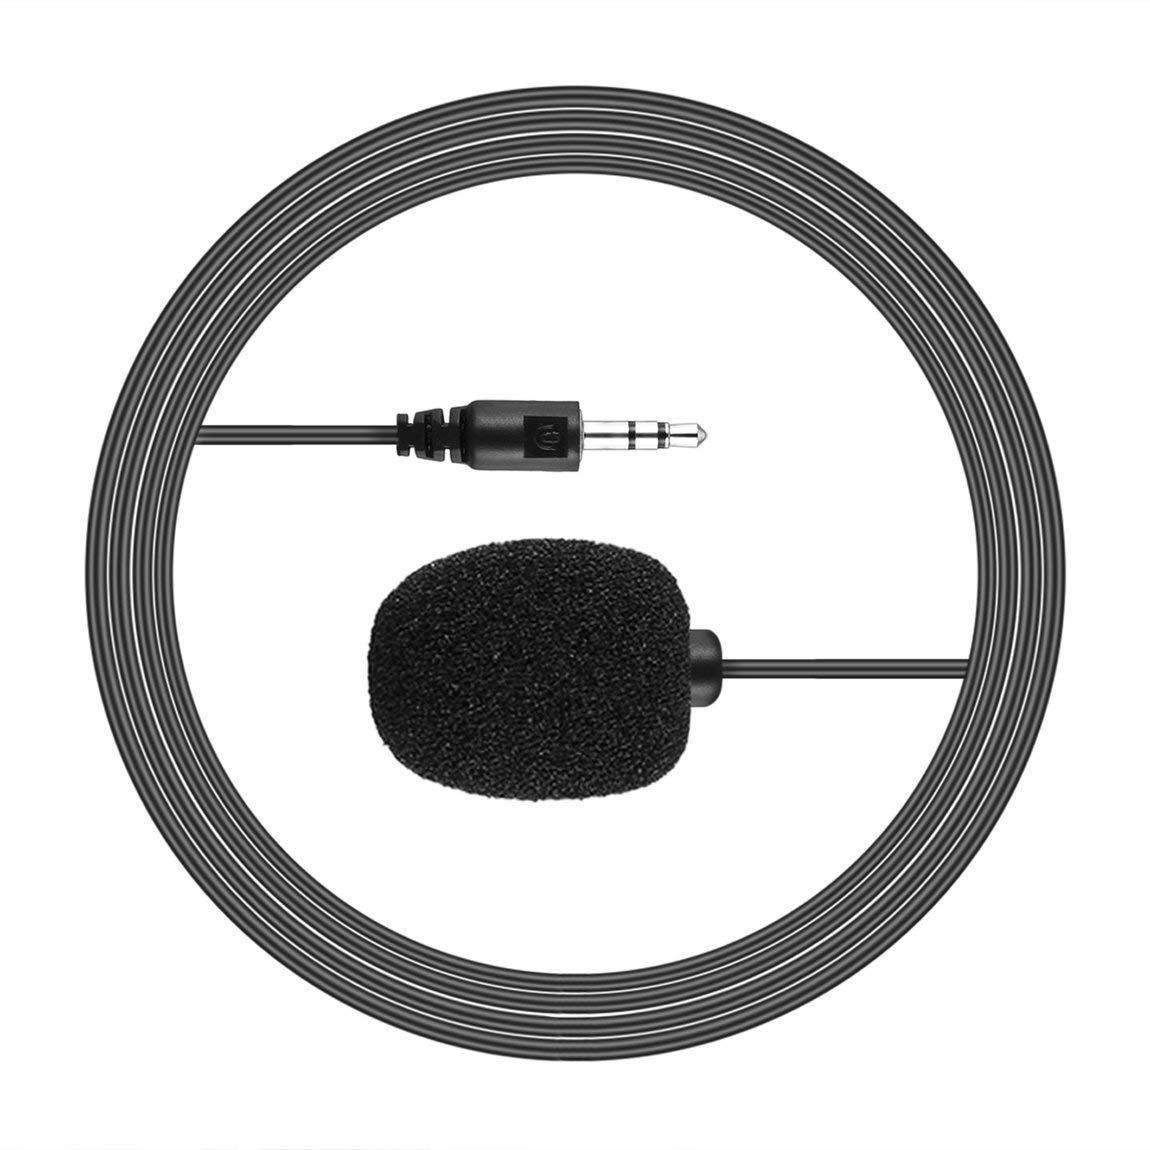 73JohnPol Port/átil Externo de 3,5 mm con Manos Libres Mini con Cable Clip de Solapa Micr/ófono lavalier para PC Laptop Lound Speaker Color: Negro